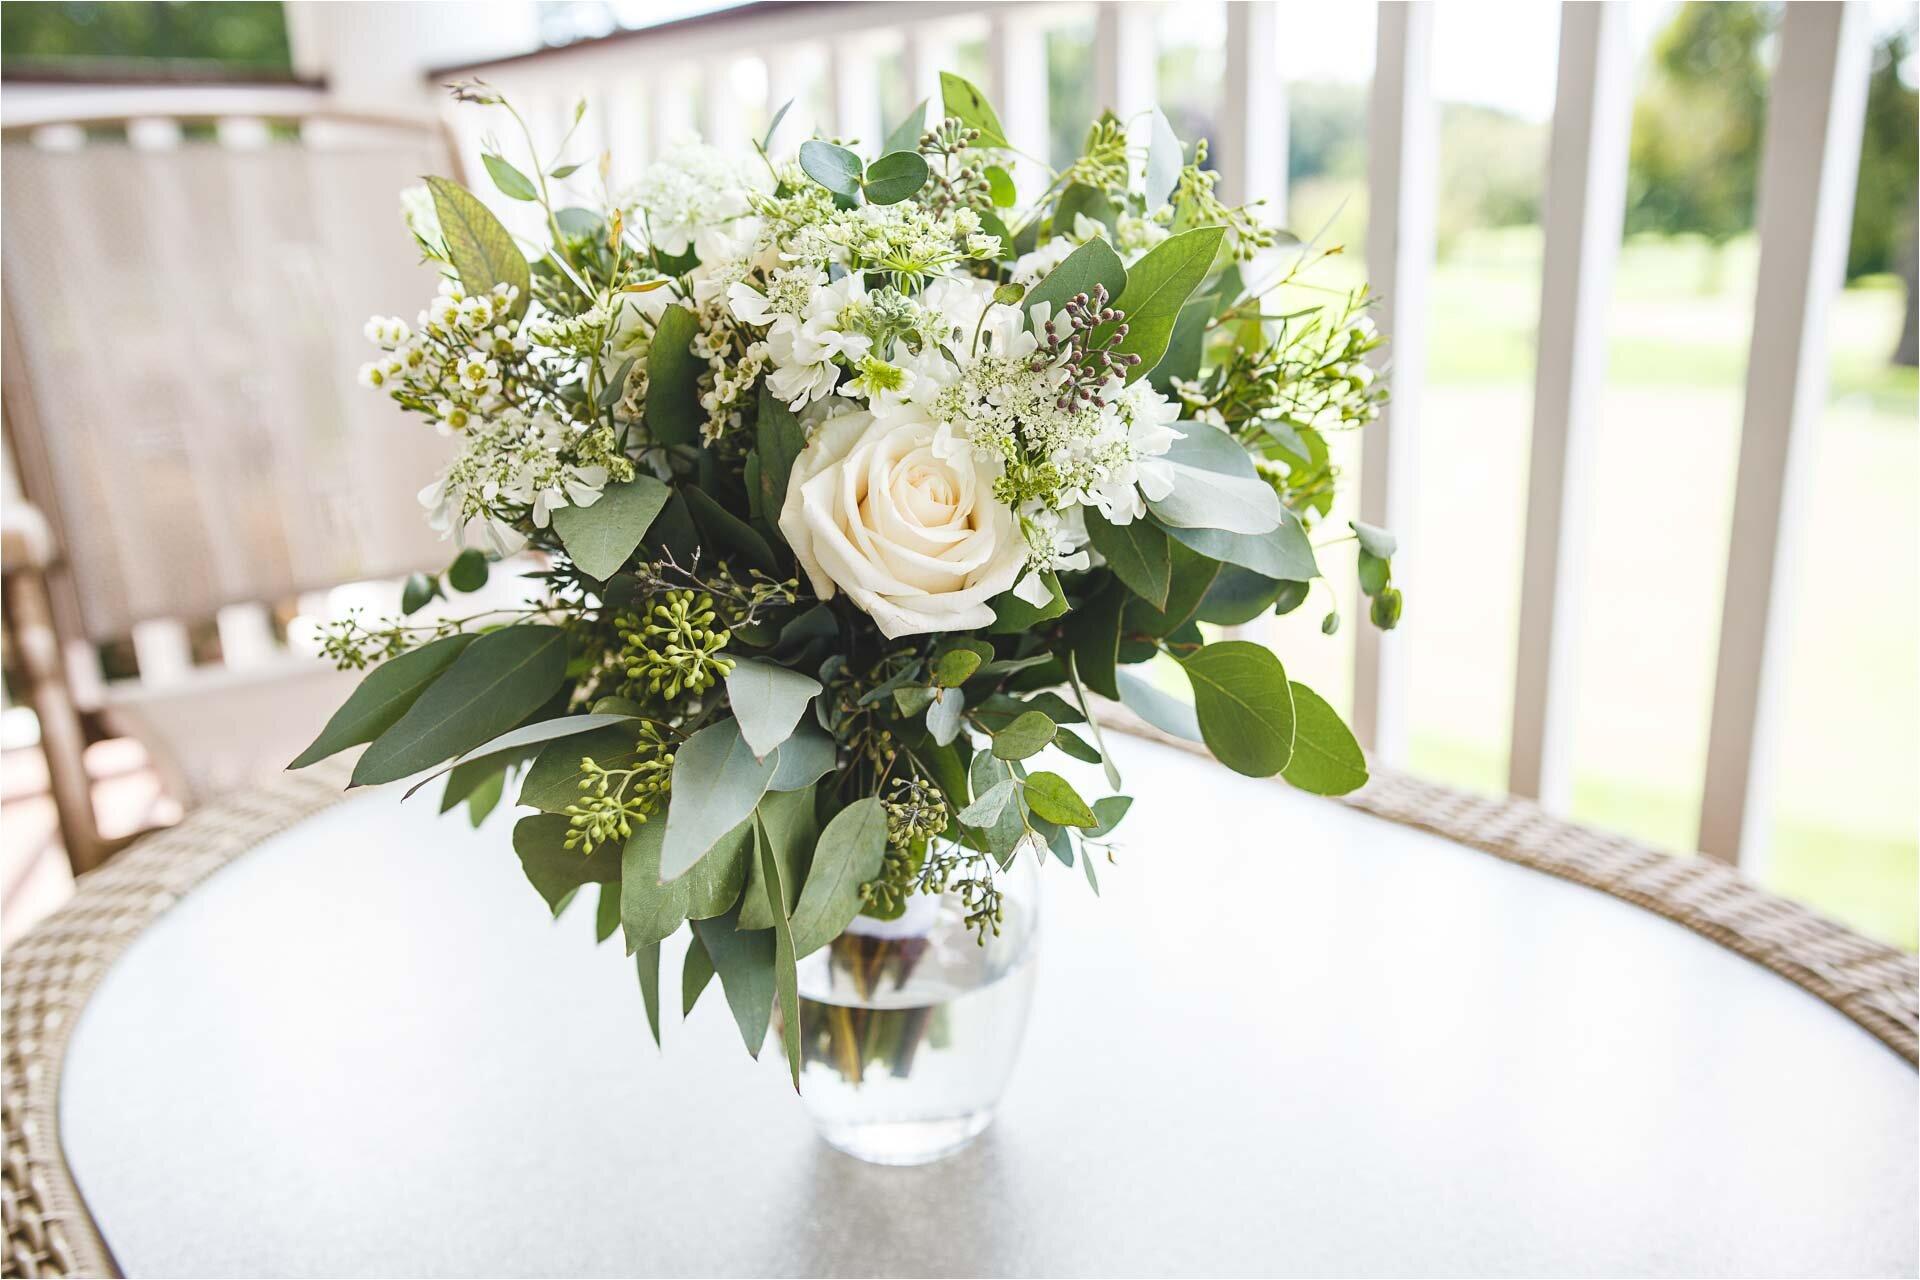 racebrook-countryclub-wedding-photography-06.jpg